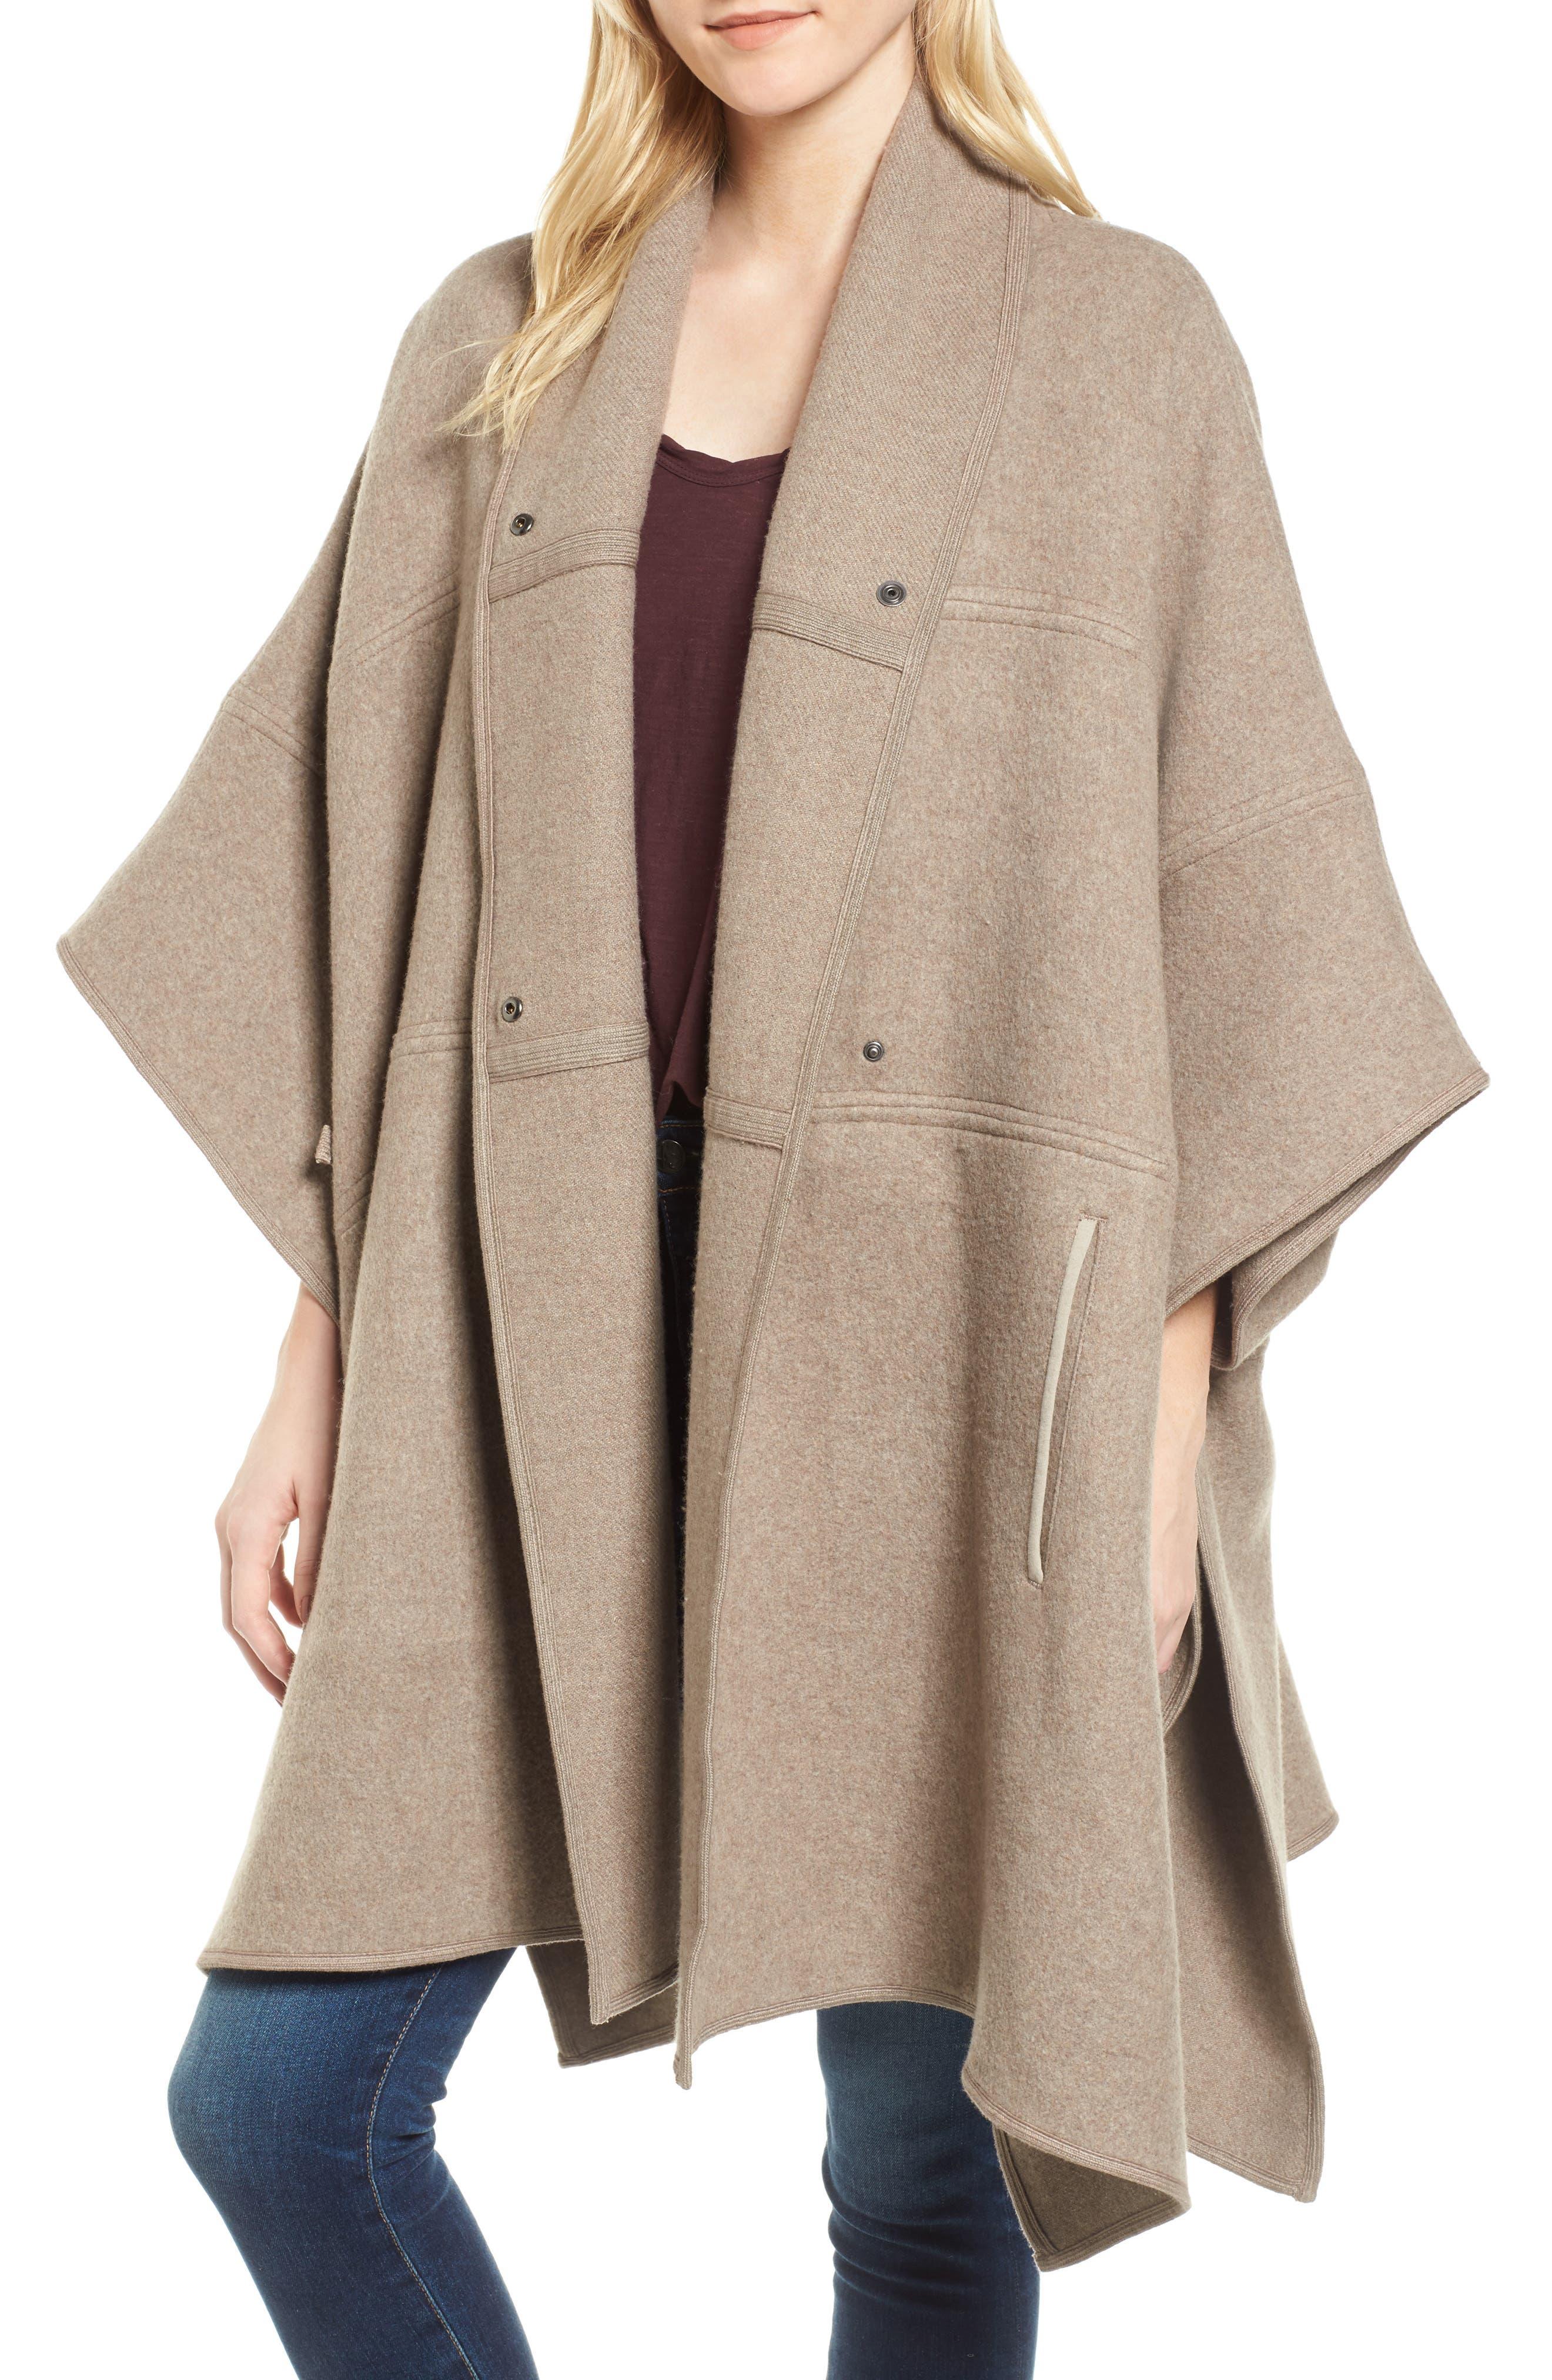 Nomad Blanket Coat,                             Alternate thumbnail 4, color,                             243